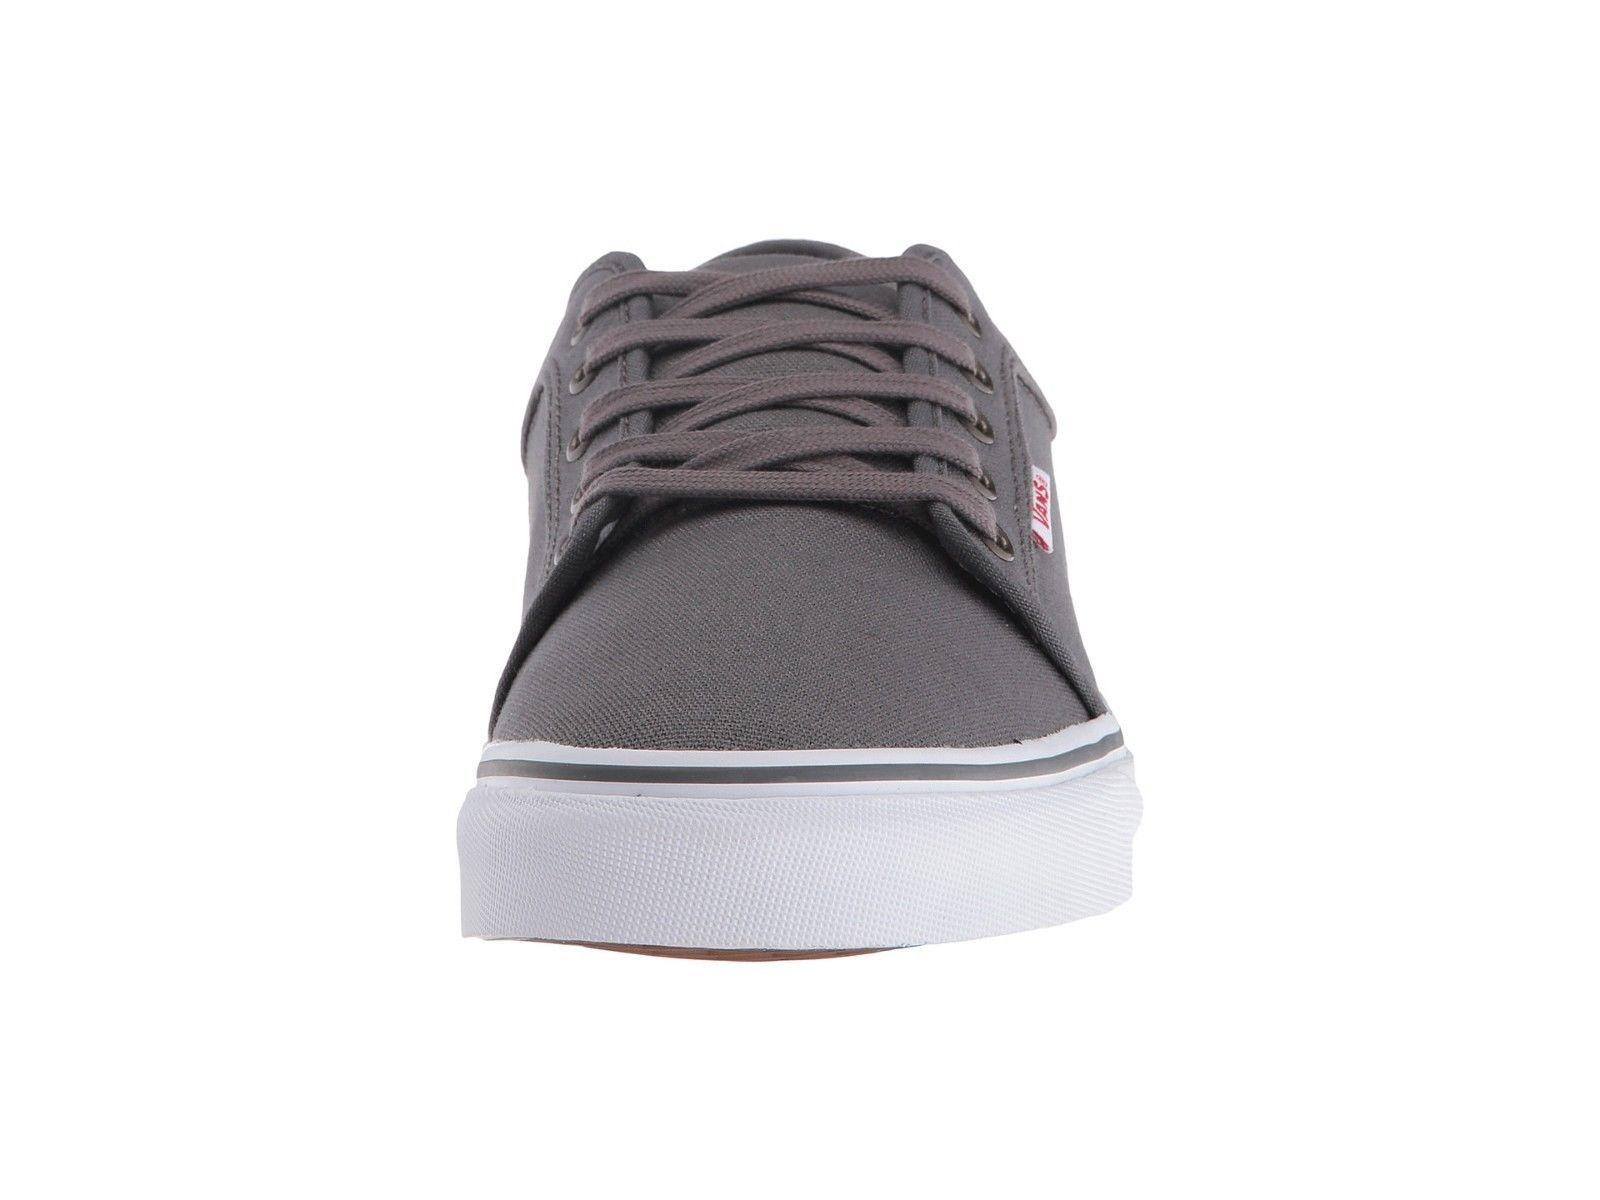 VANS Chukka Low Pewter/White/Red Skate Shoes MEN'S 6.5 WOMEN'S 8 image 3